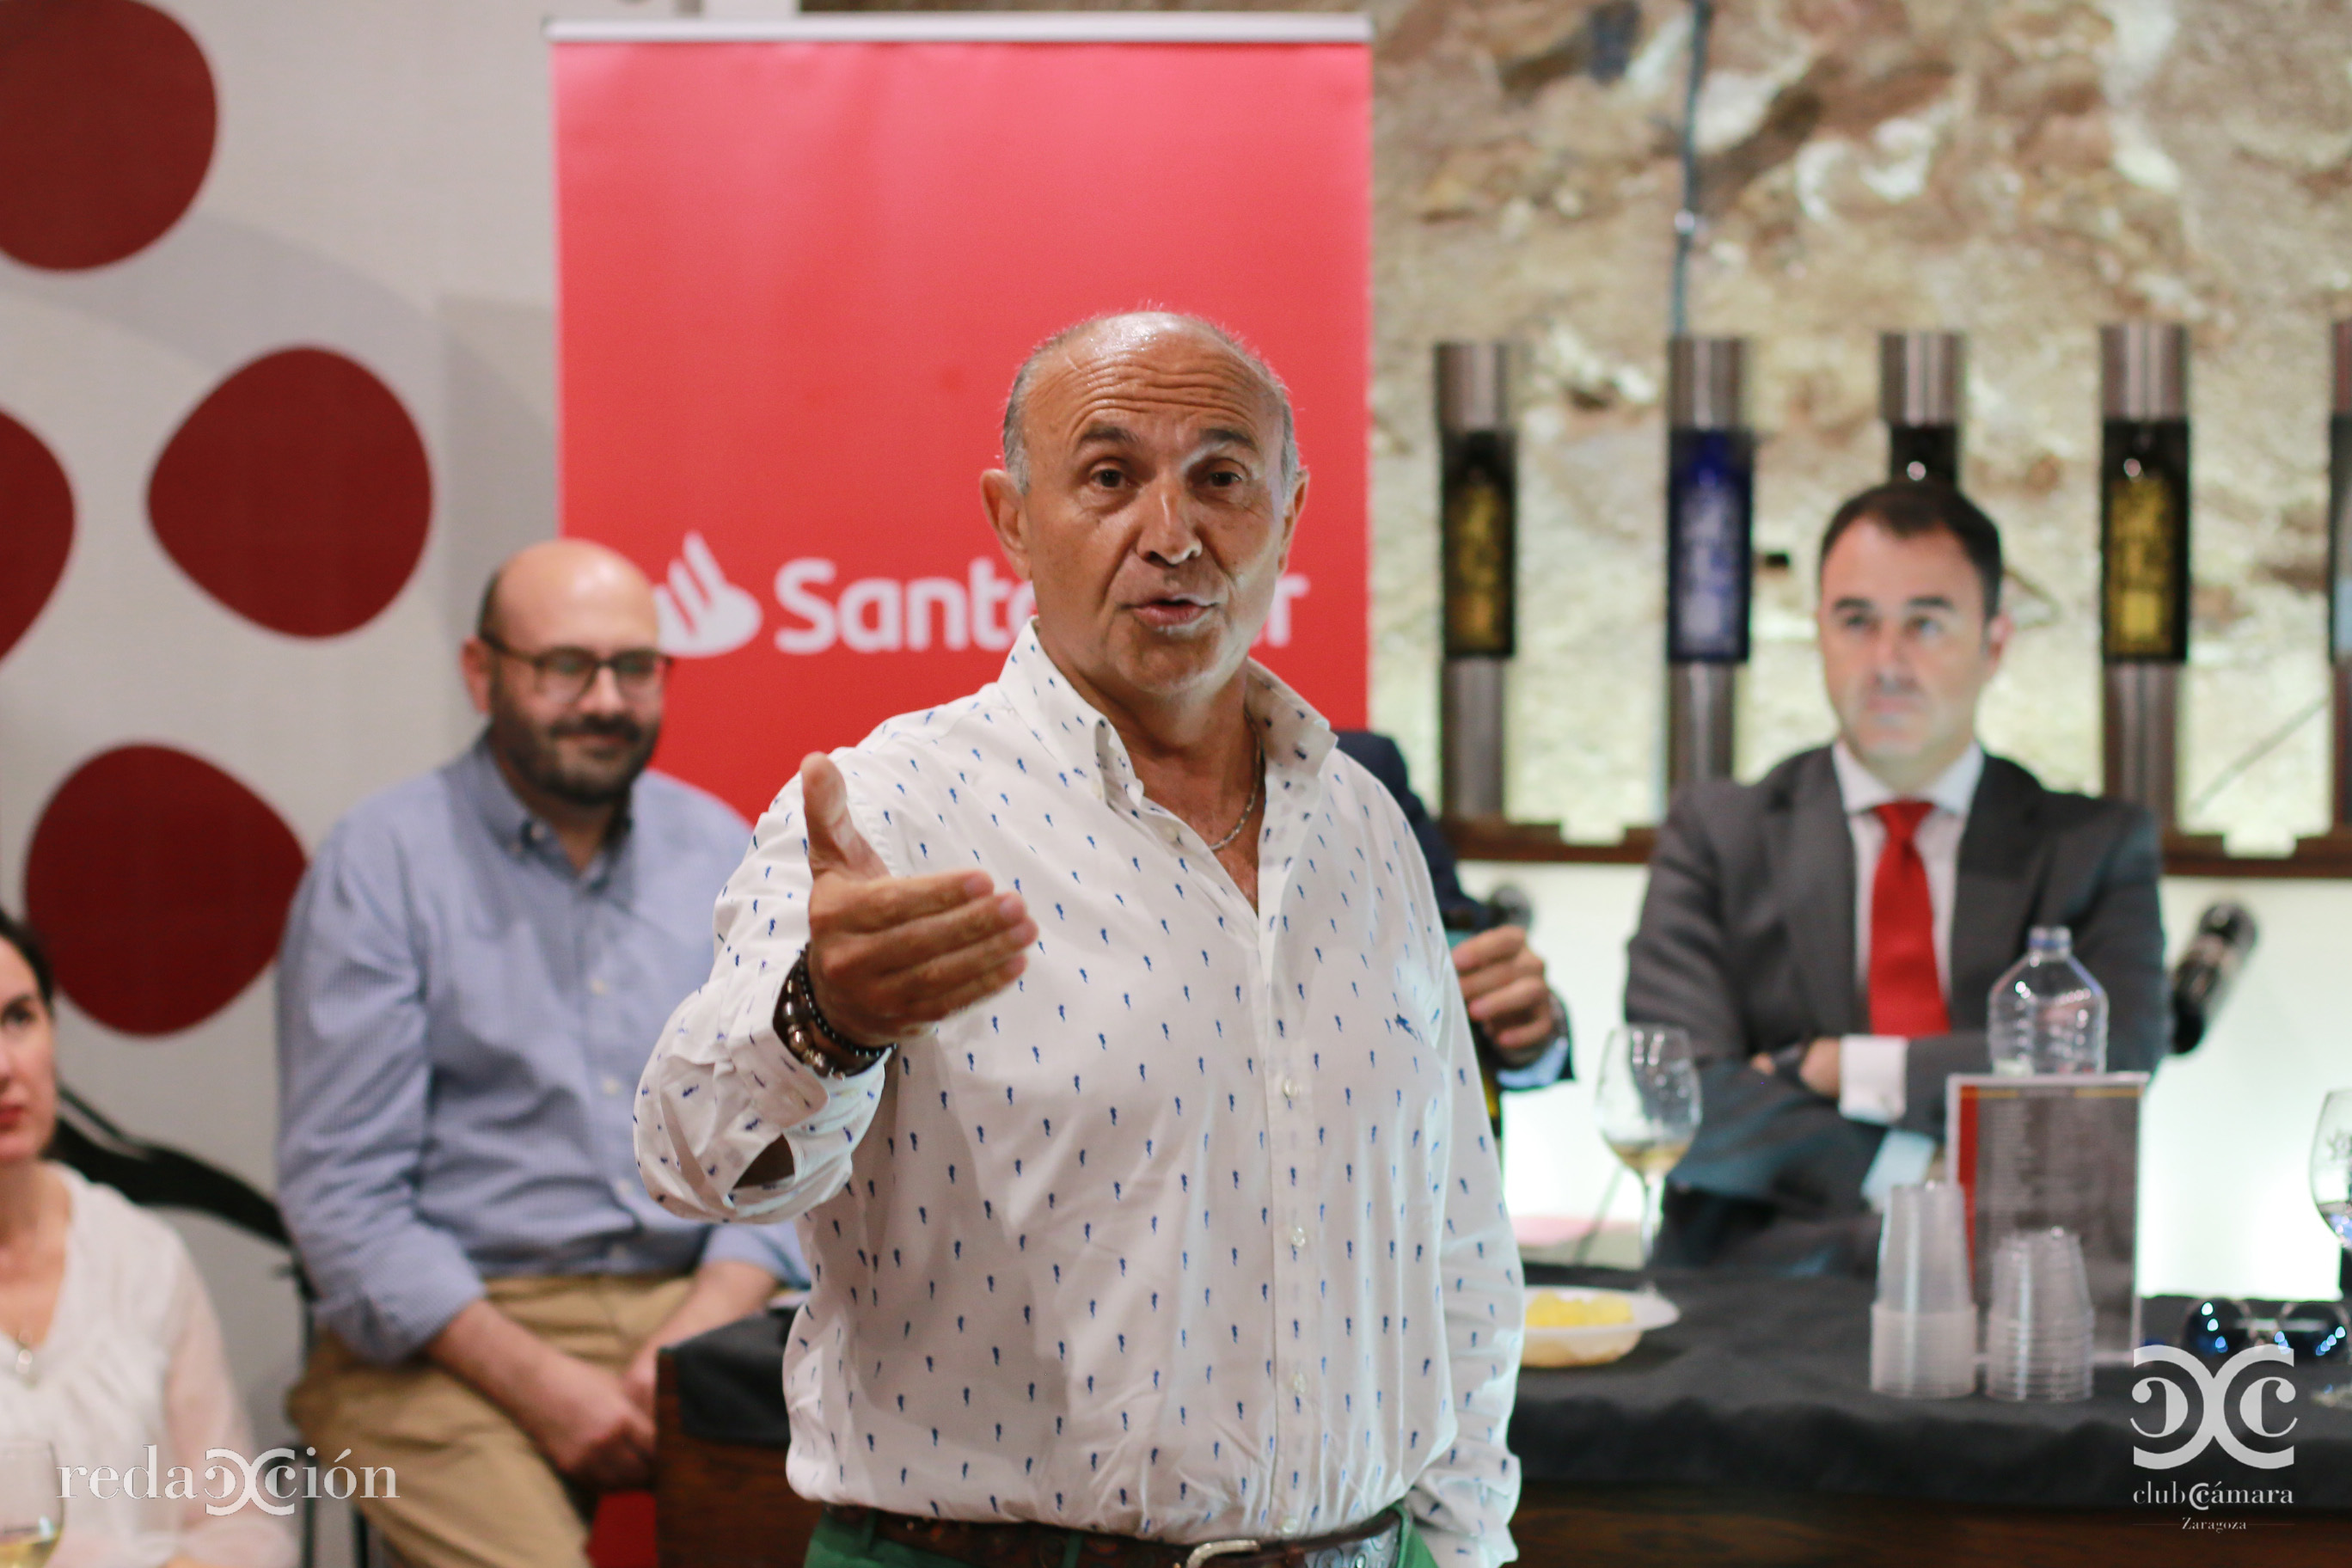 Carlos Pascual, Integra